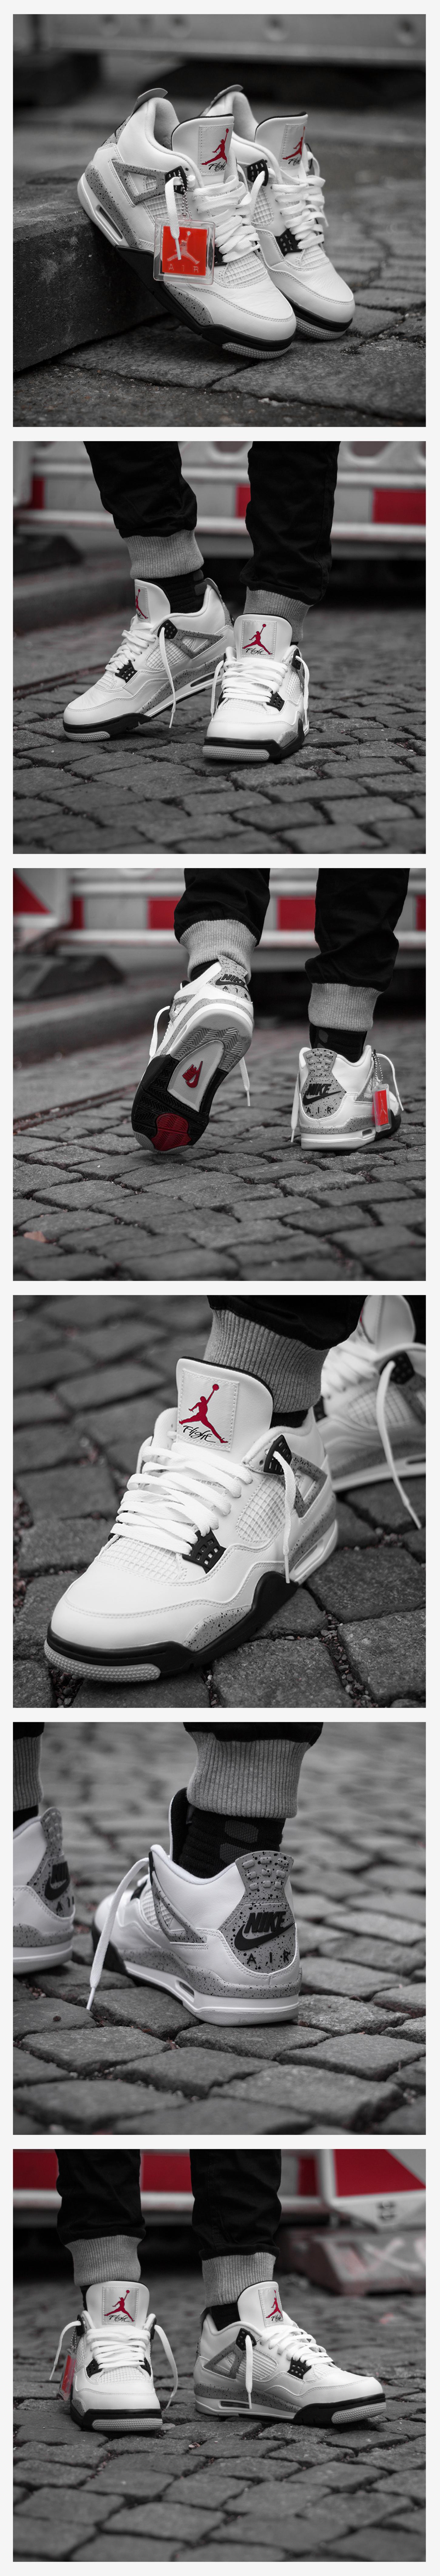 705ffca3f64 The Air Jordan 4 Retro OG